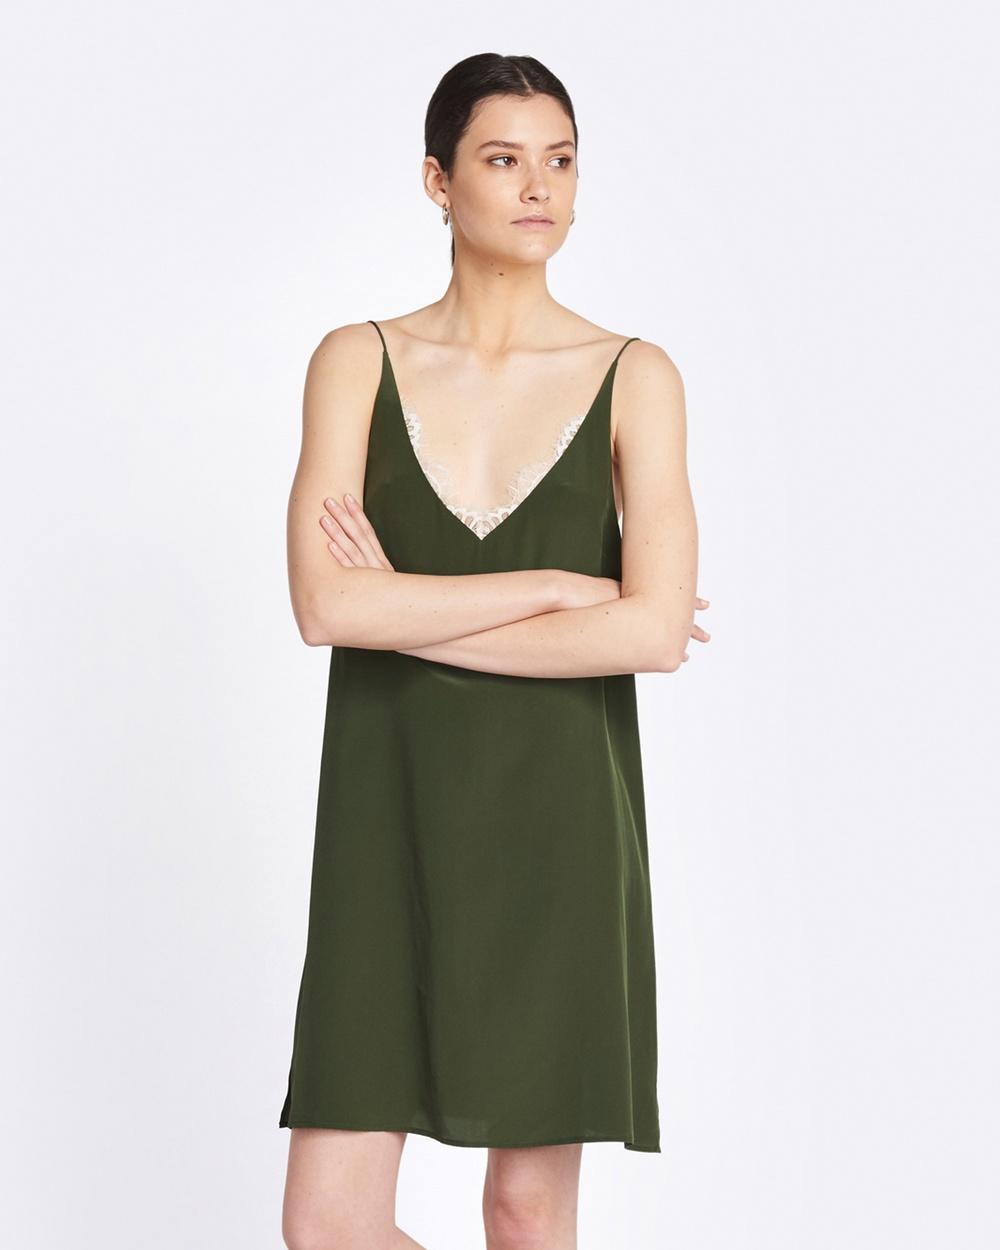 GINIA RTW Jasmin Silk Lace Dress Dresses Forest-Nude Lace Jasmin Silk Lace Dress